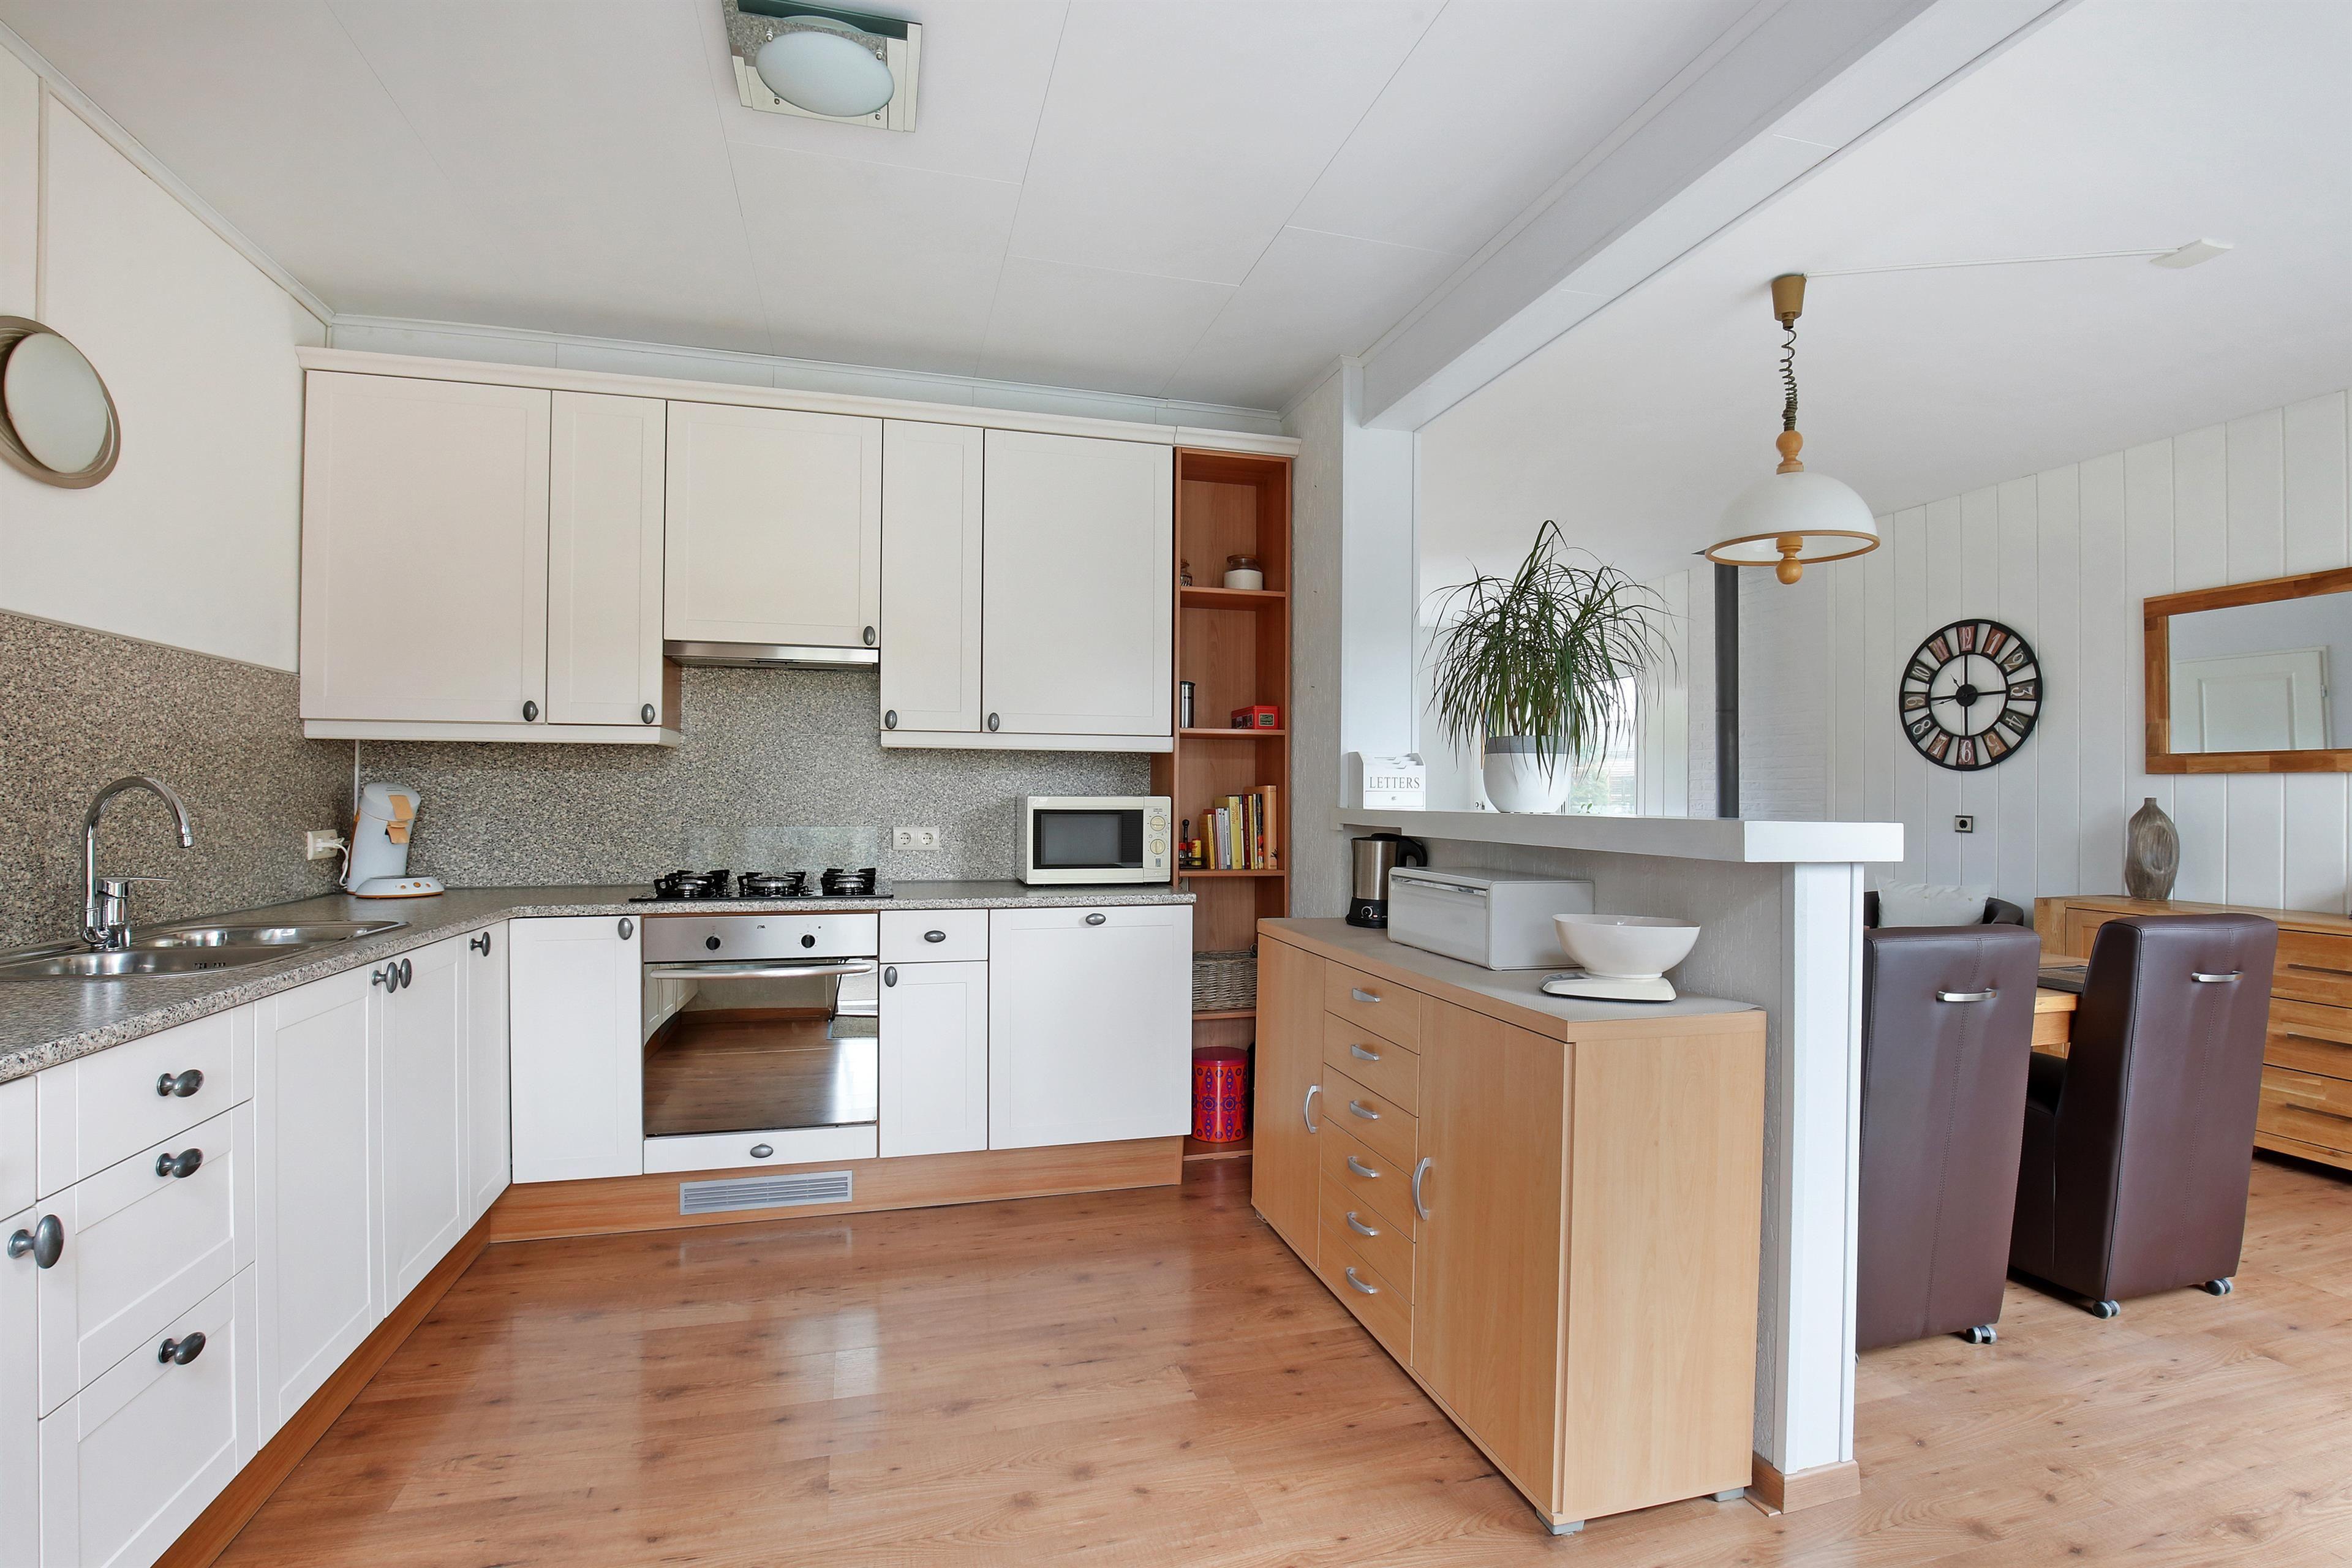 Half Open Keuken : Half open keuken met alle wensbare apparatuur keukens kitchen